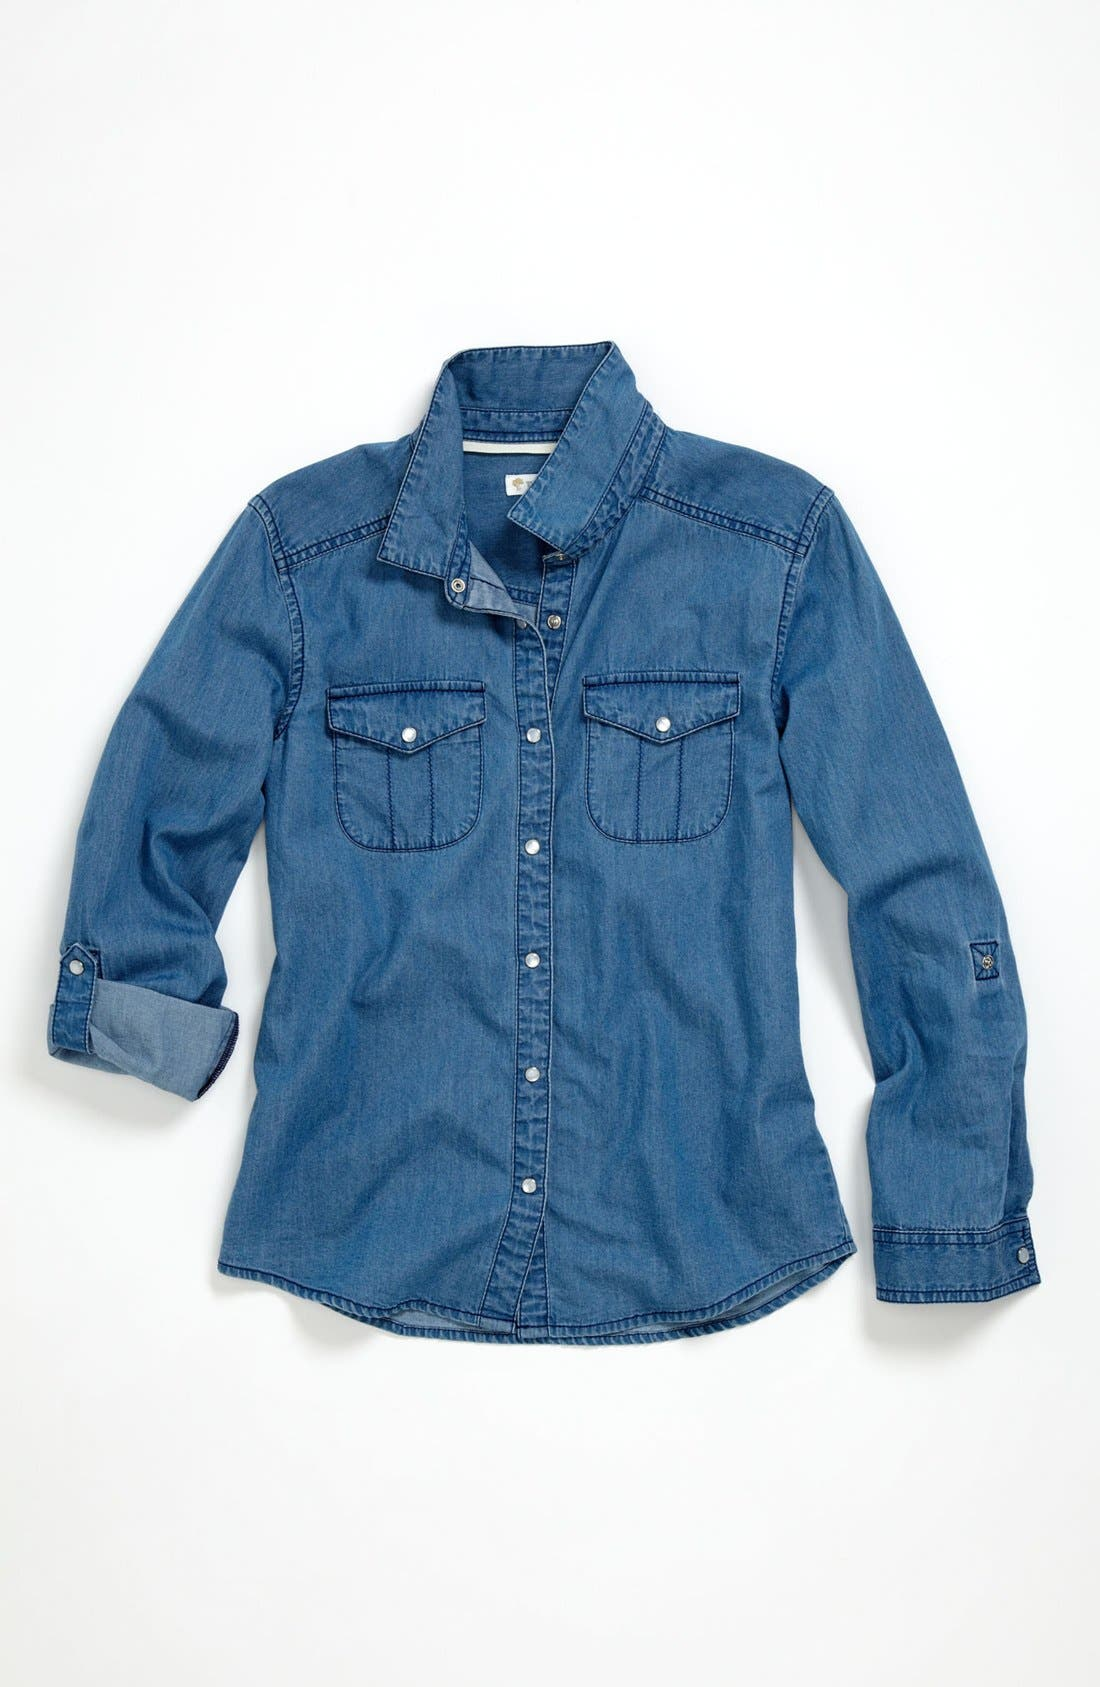 Alternate Image 1 Selected - Tucker + Tate 'Angie' Chambray Shirt (Big Girls)